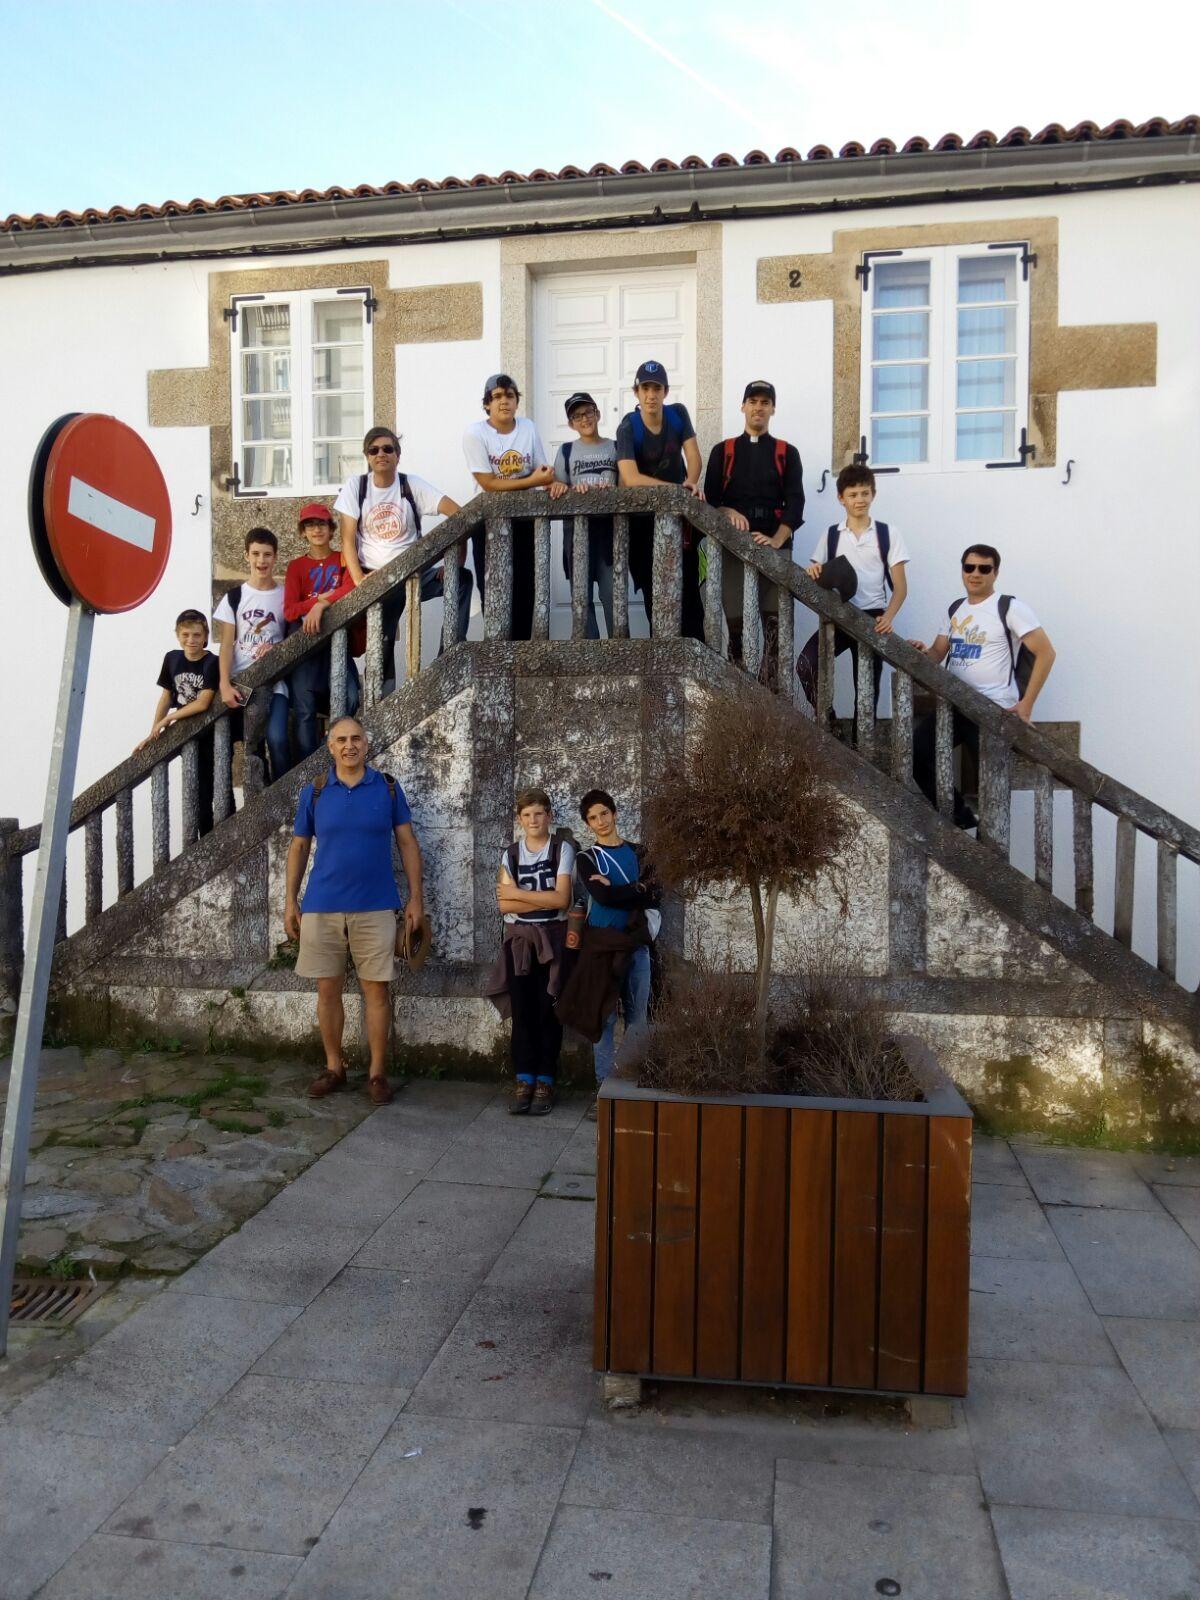 Segunda etapa del Camino de Santiago